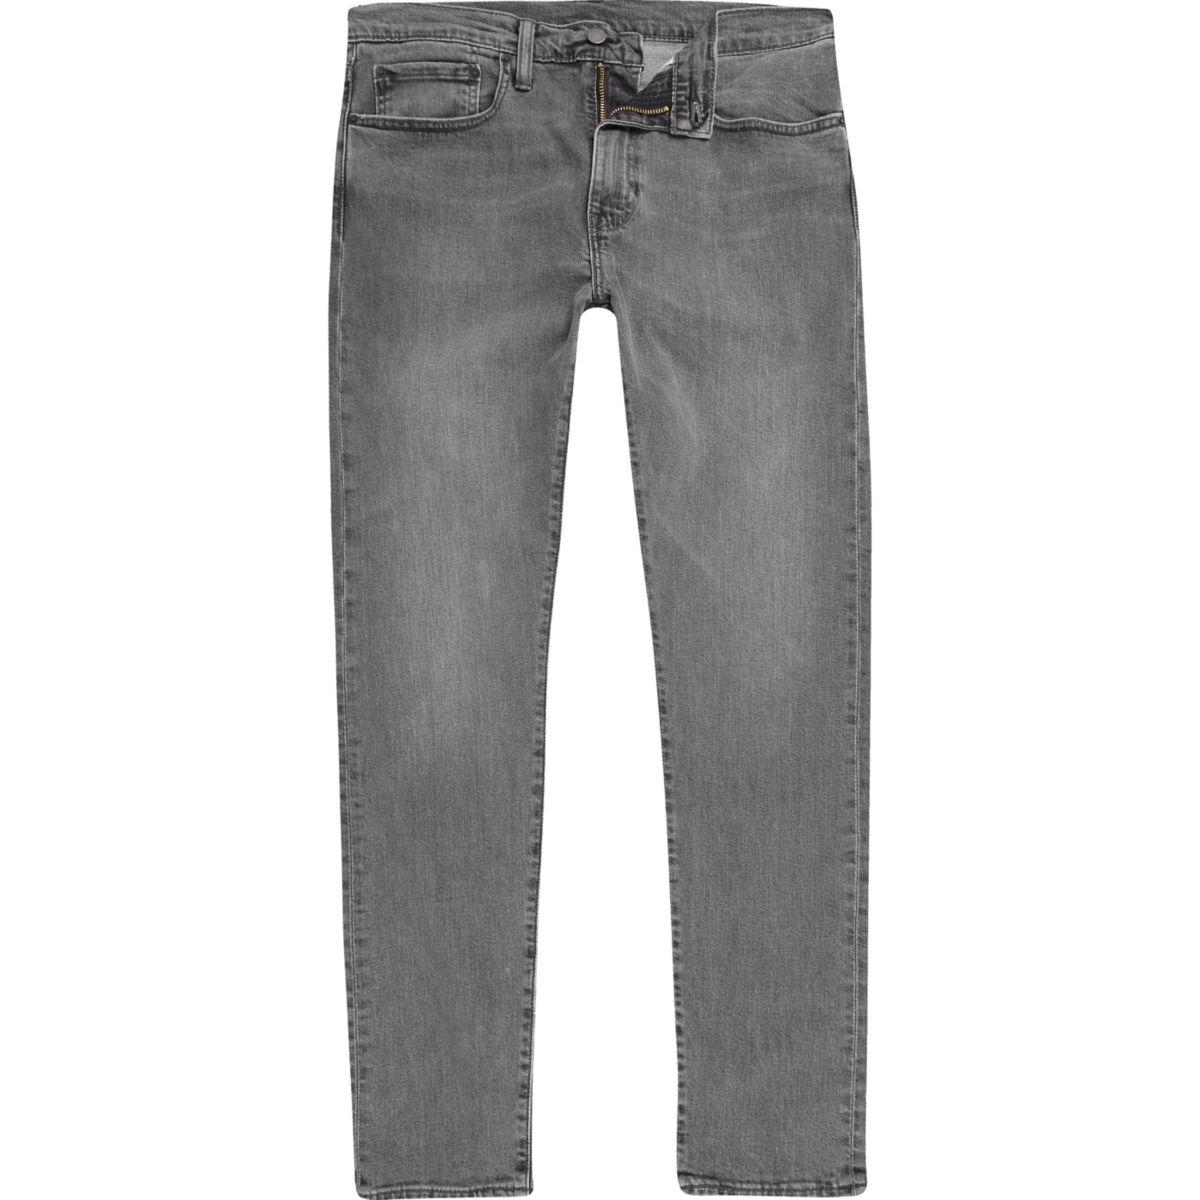 Levi's grey 512 slim taper fit jeans